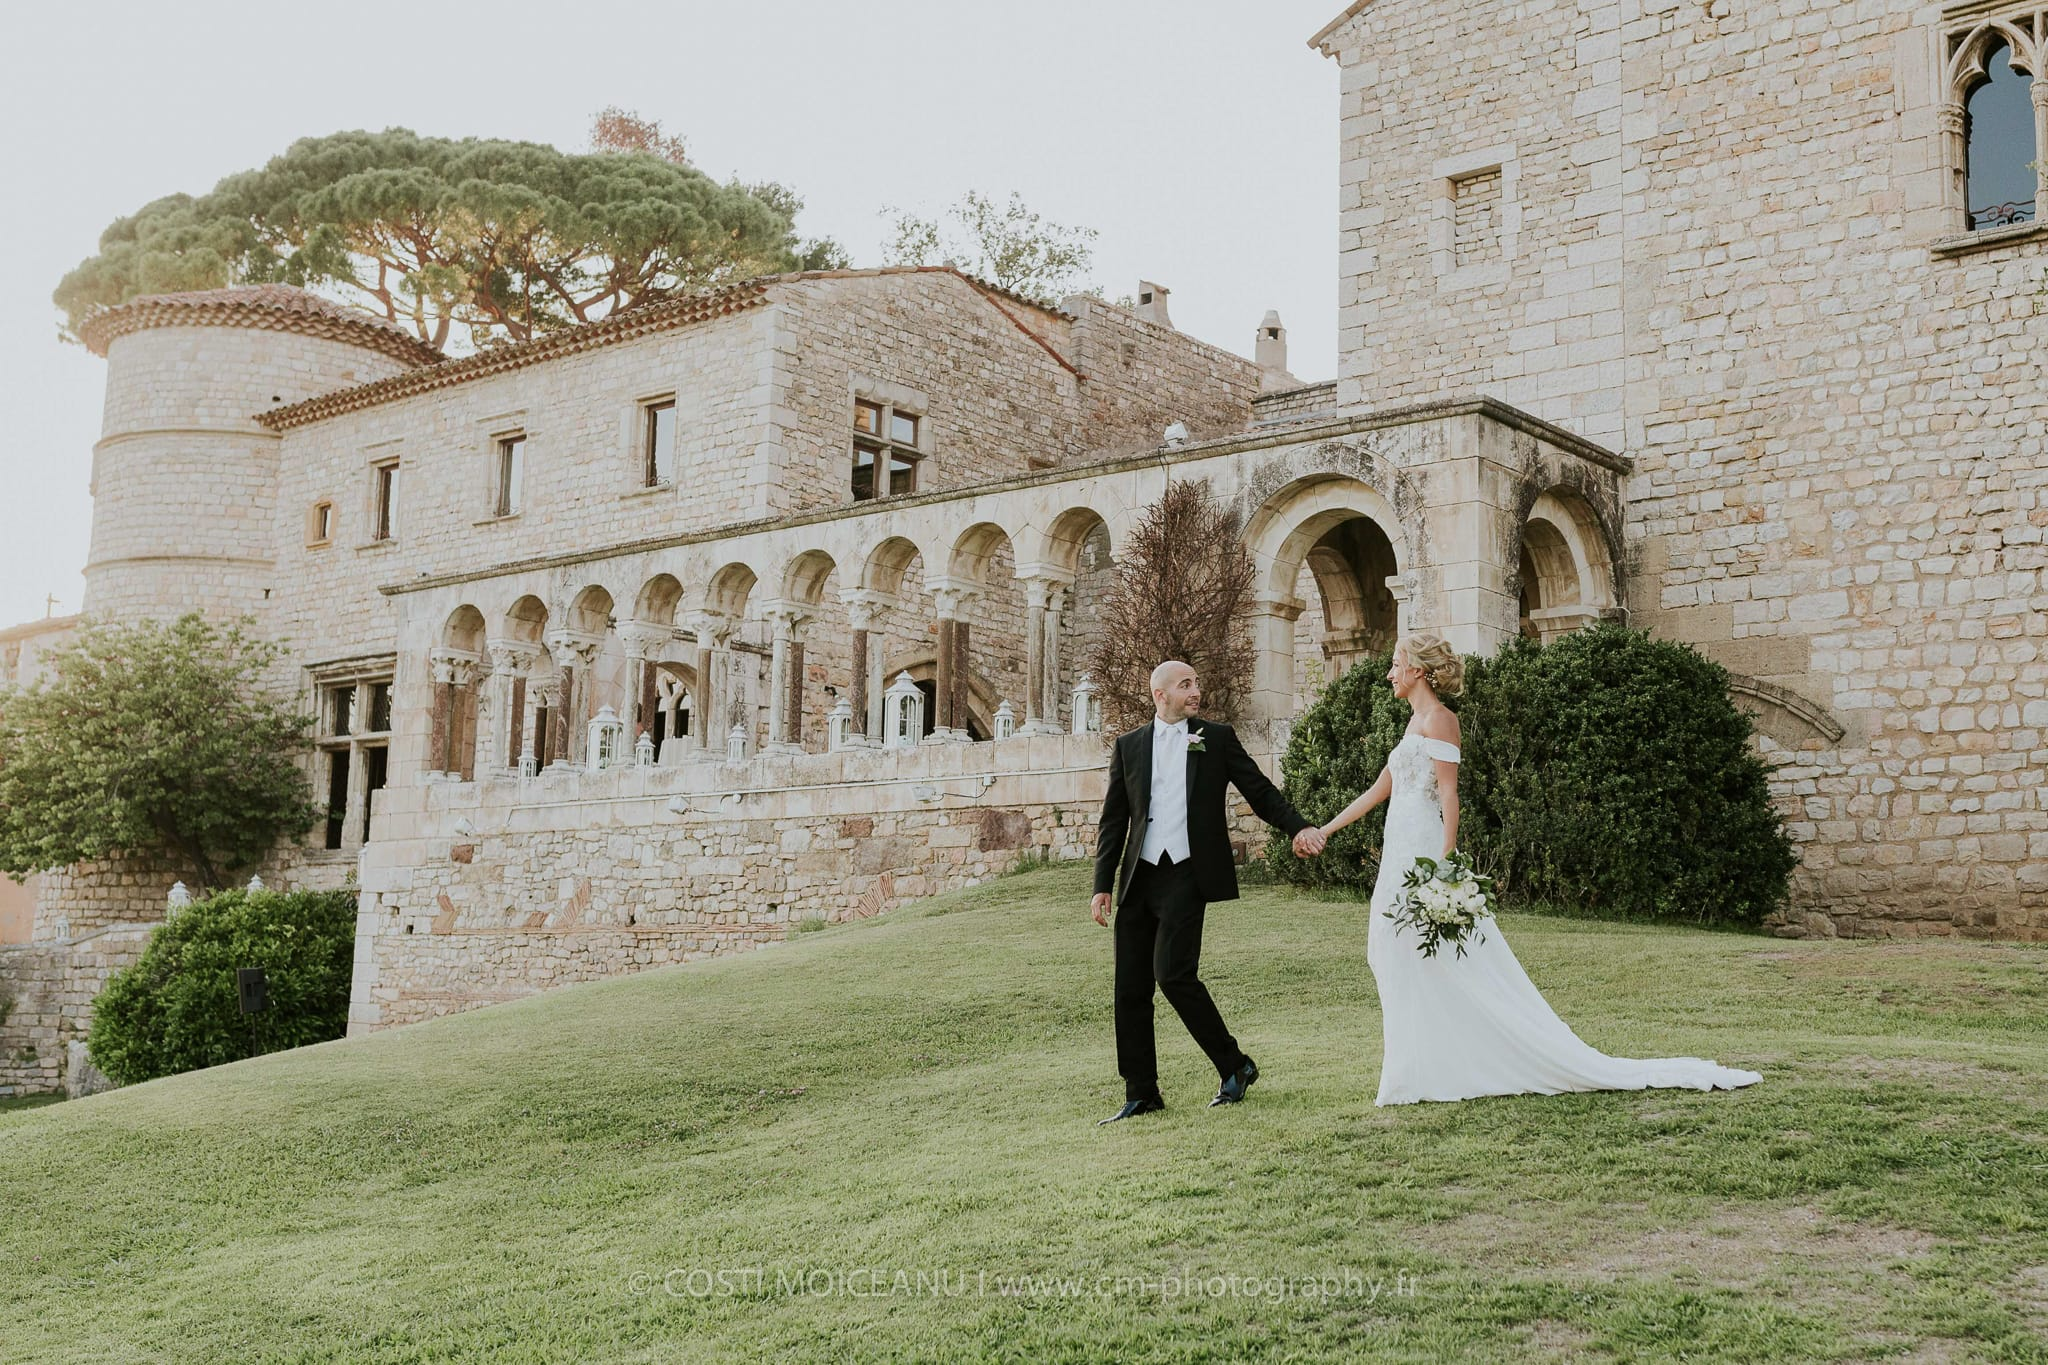 Priscilla & Vincent - Chateau Castellaras - Costi Moiceanu